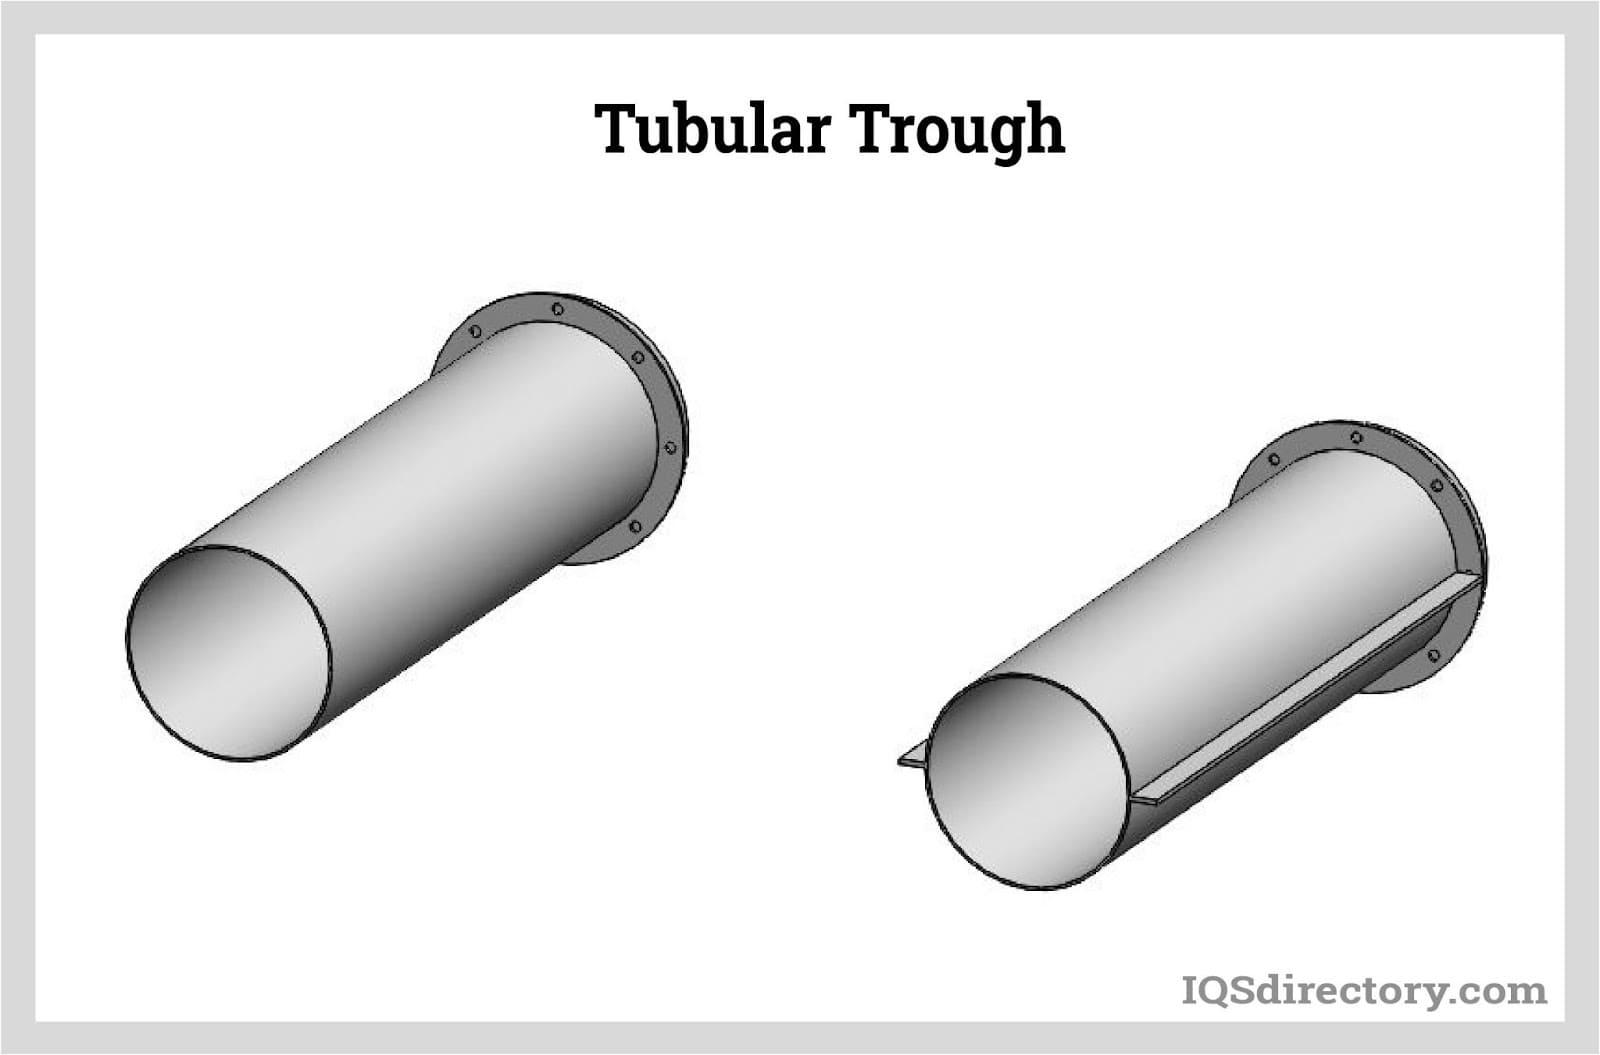 Tubular Trough